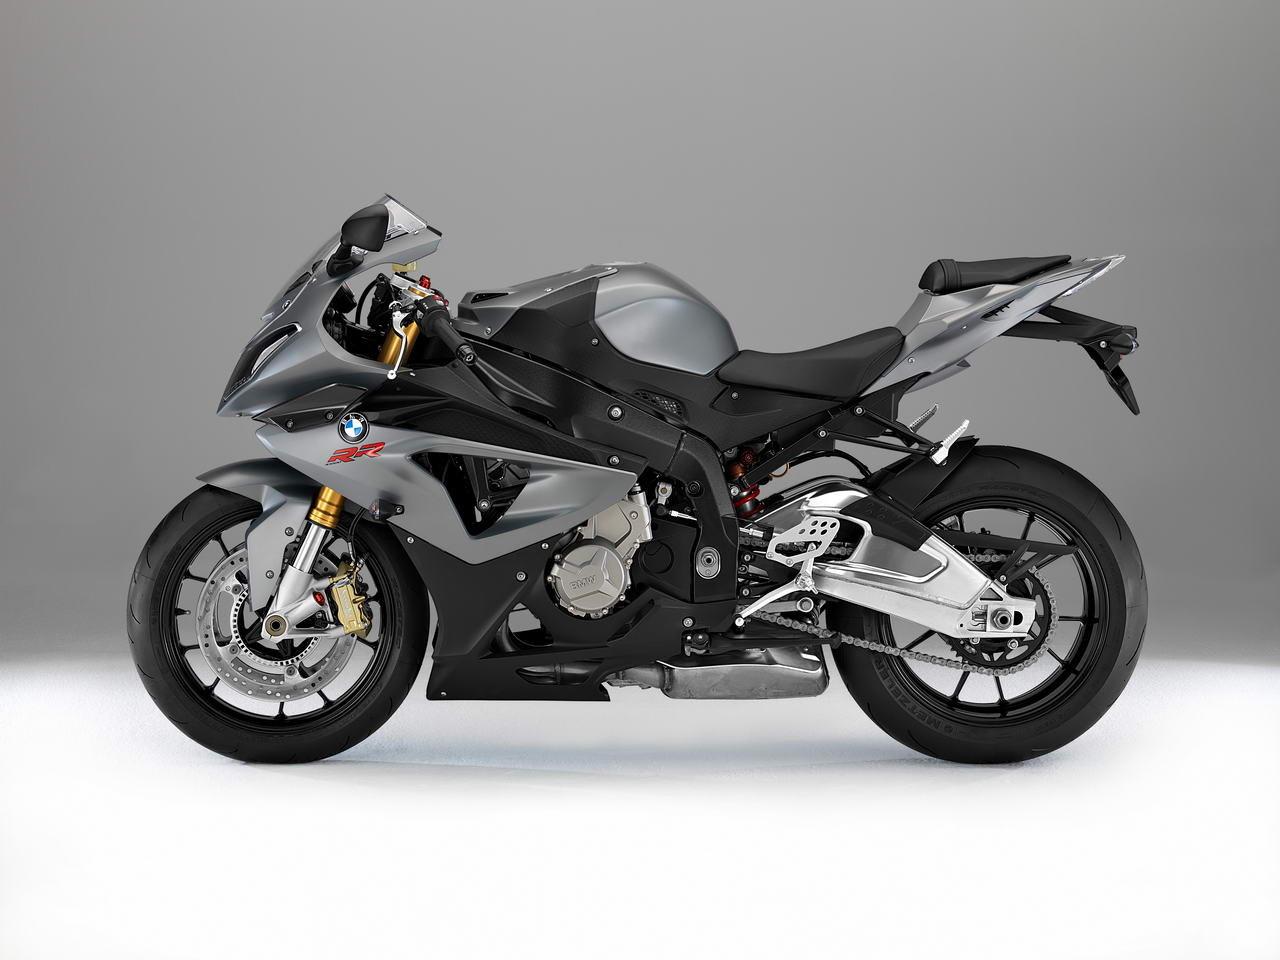 Listino Bmw C650 GT Scooter oltre 300 - image 14483_bmw-s1000-rr on https://moto.motori.net